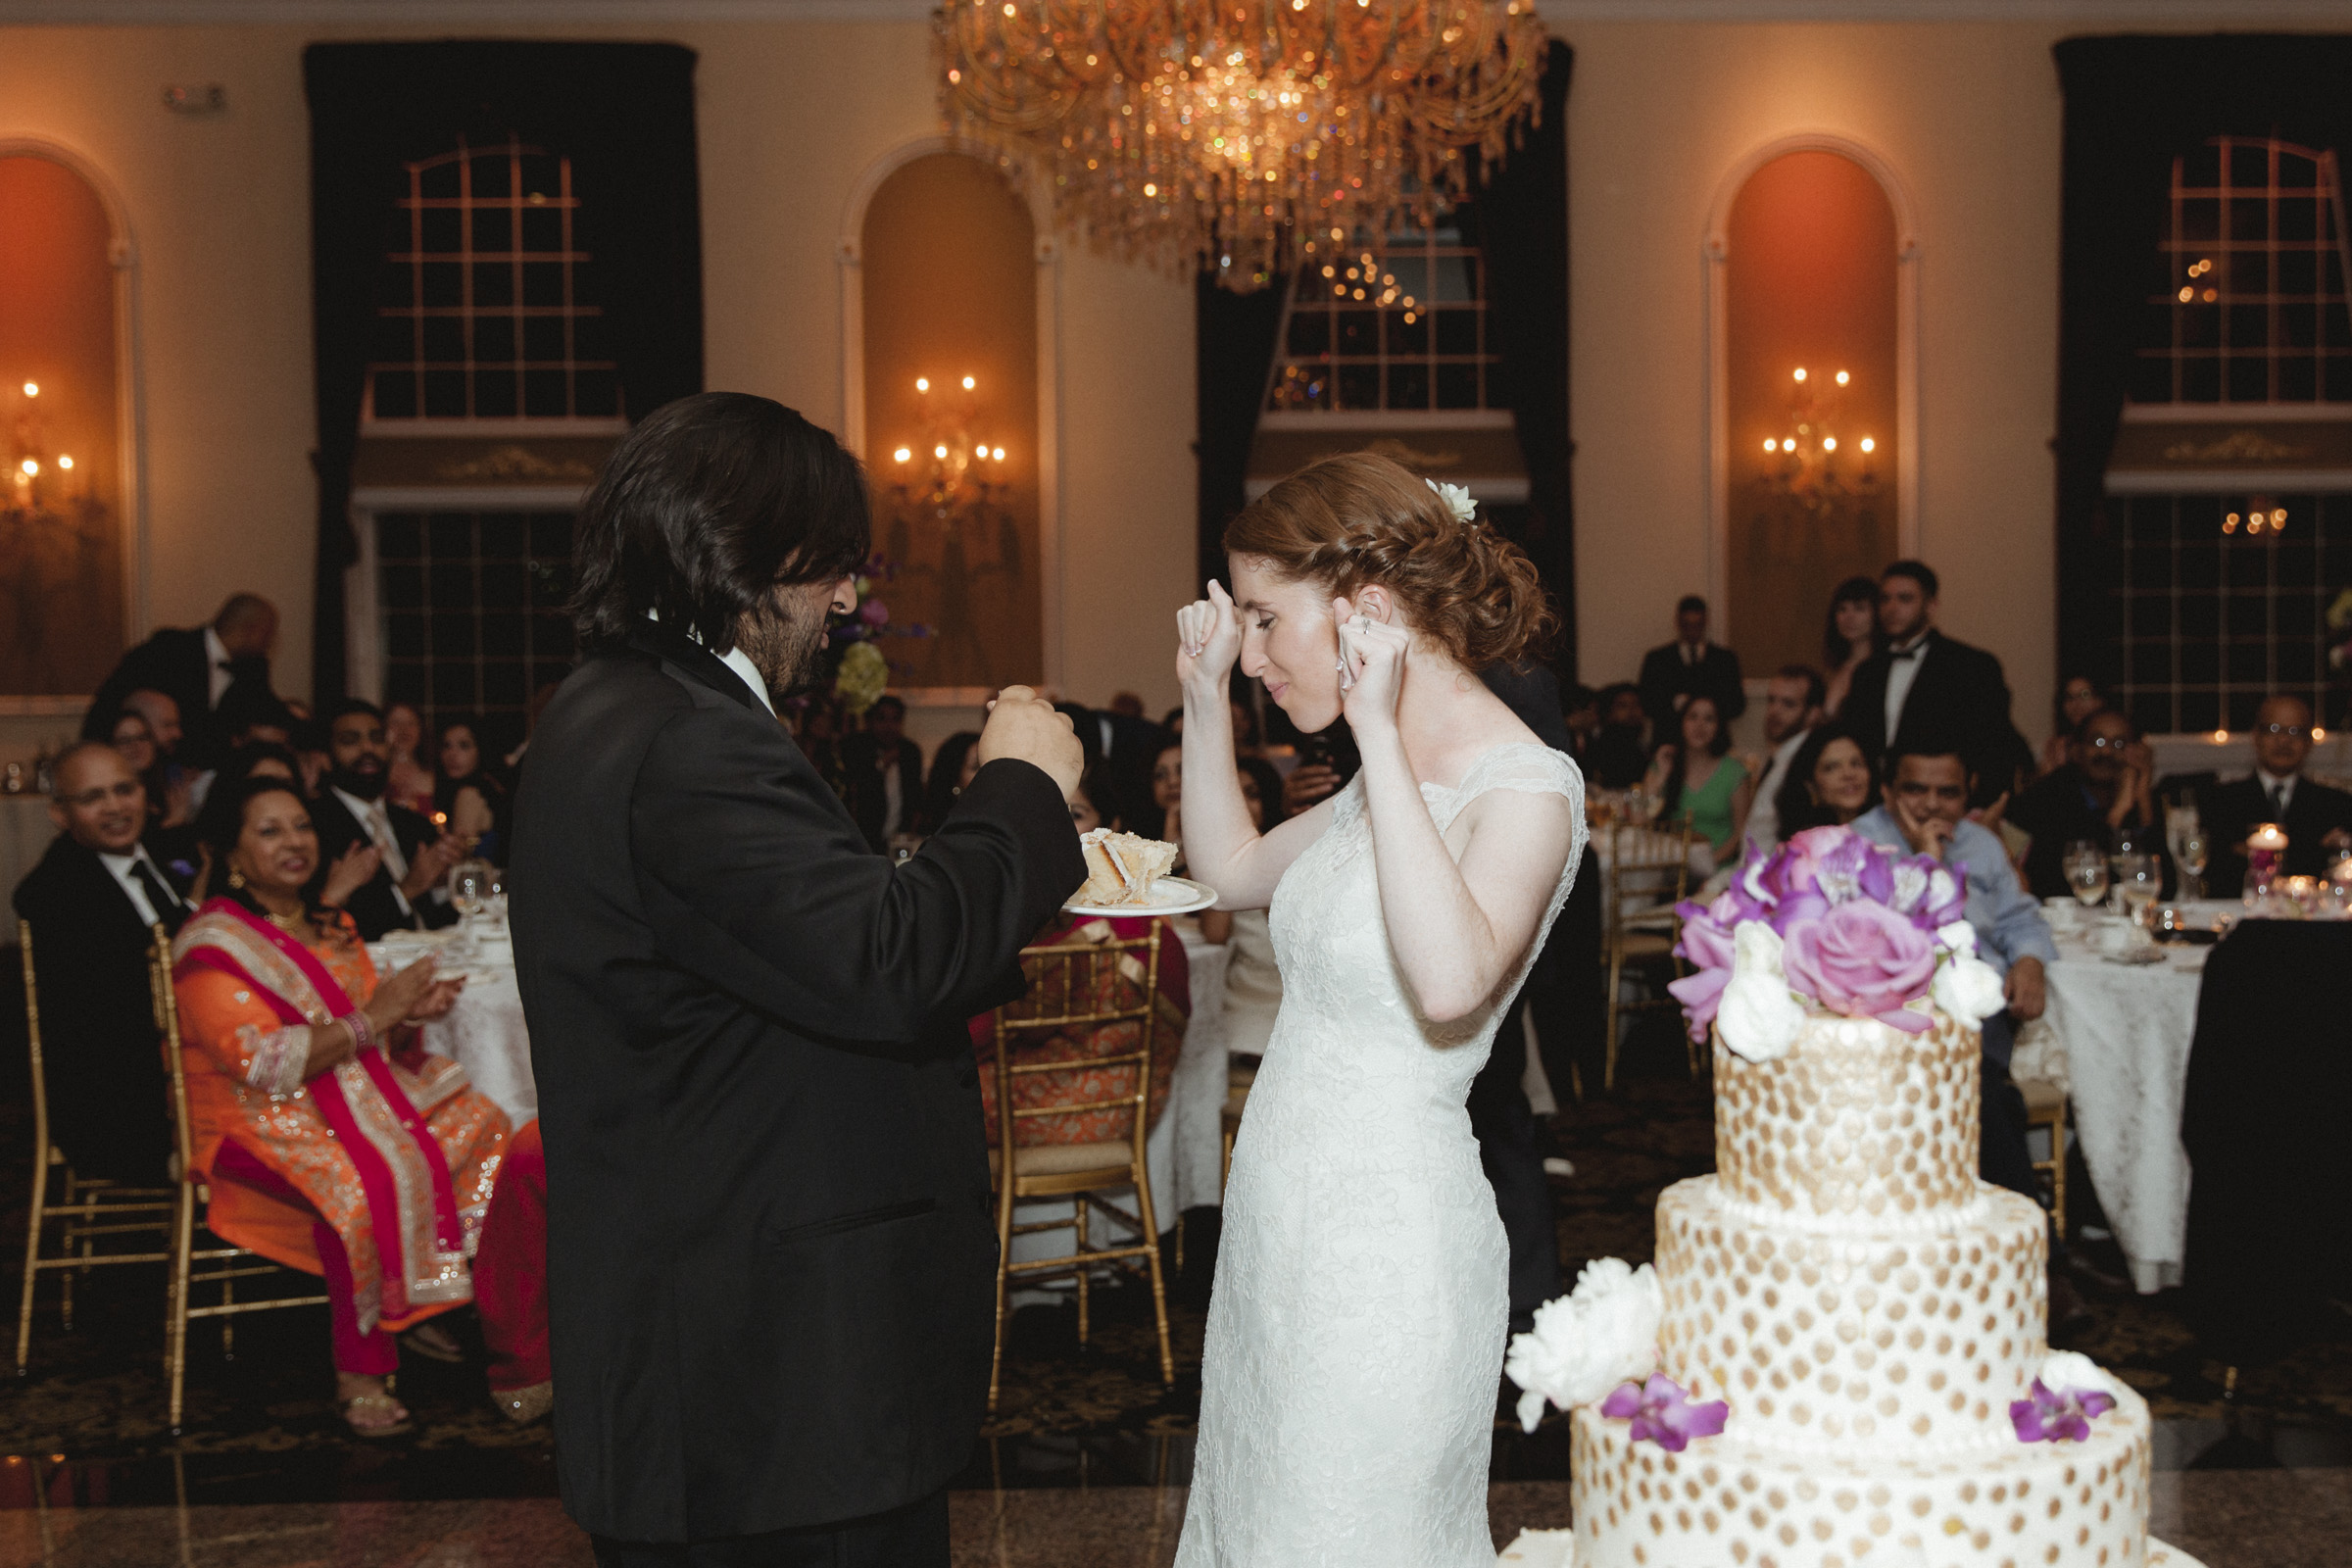 Groom feeds his bride cake - Estate at Florentine Gardens wedding - Hudson Valley Wedding - Kelsey & Anish's wedding - Amy Sims Photography